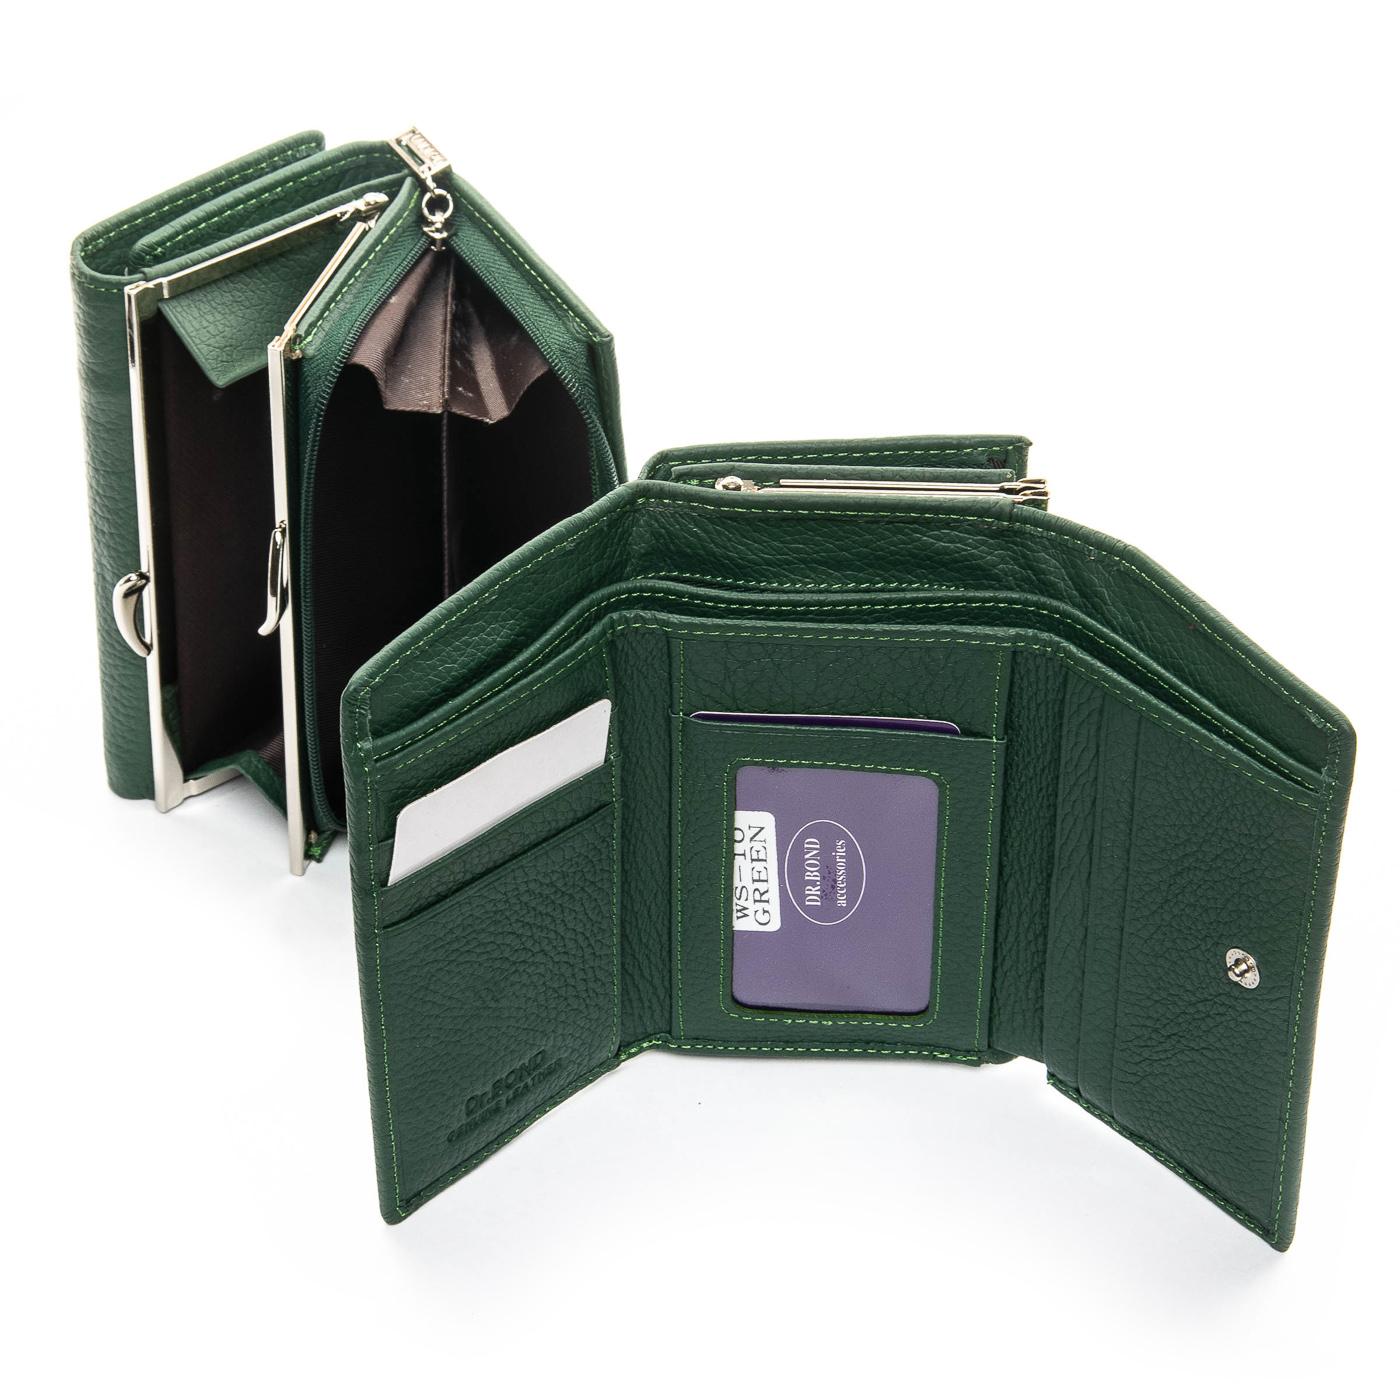 Кошелек Classic кожа DR. BOND WS-10 green - фото 4